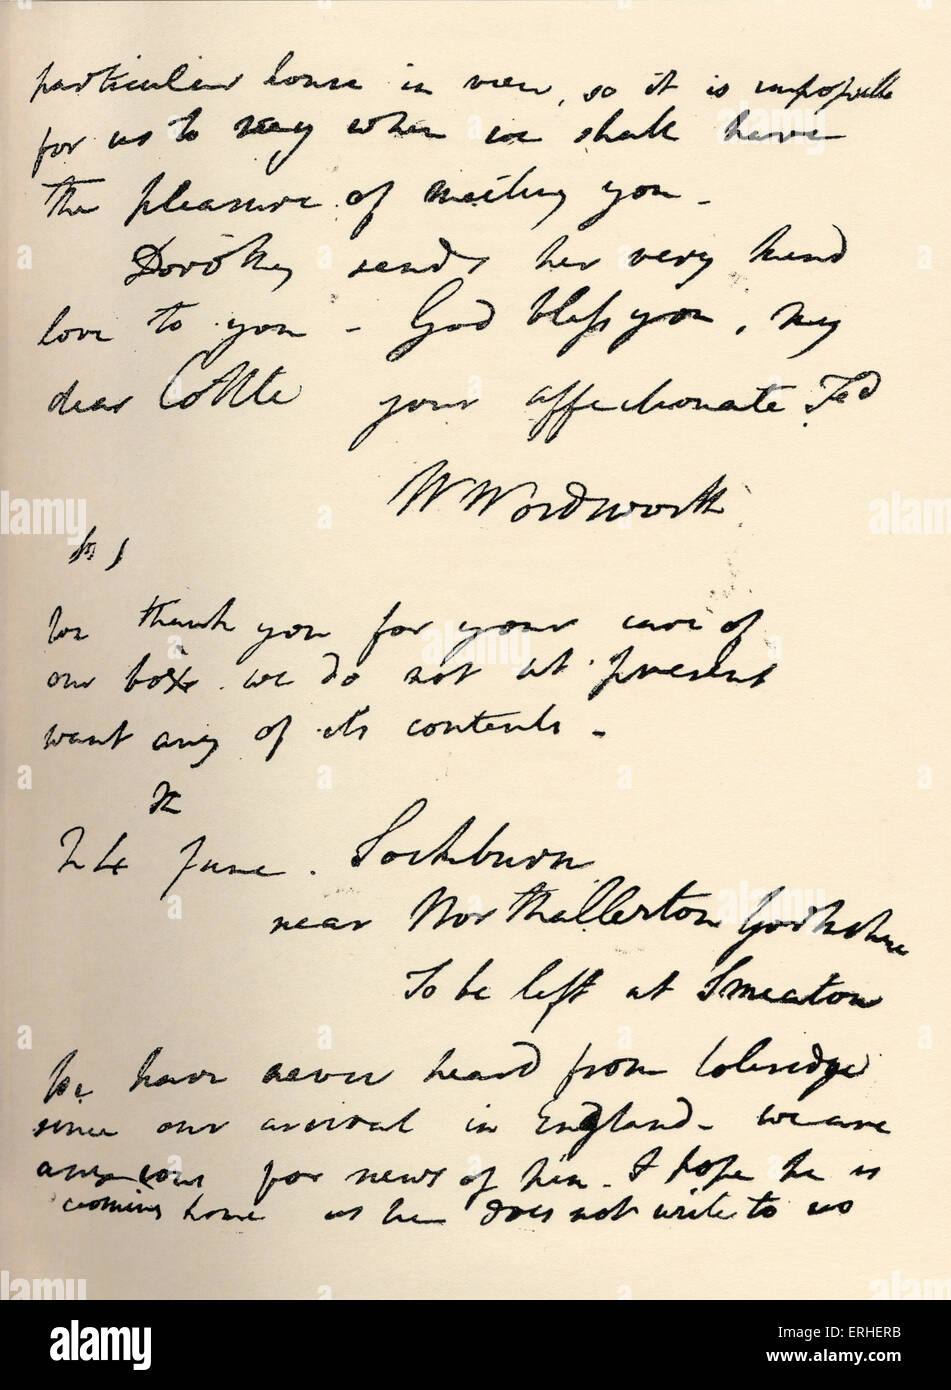 William Wordsworth autograph letter to Cottle. English poet 7 April 1770 - 13 April 1850. - Stock Image